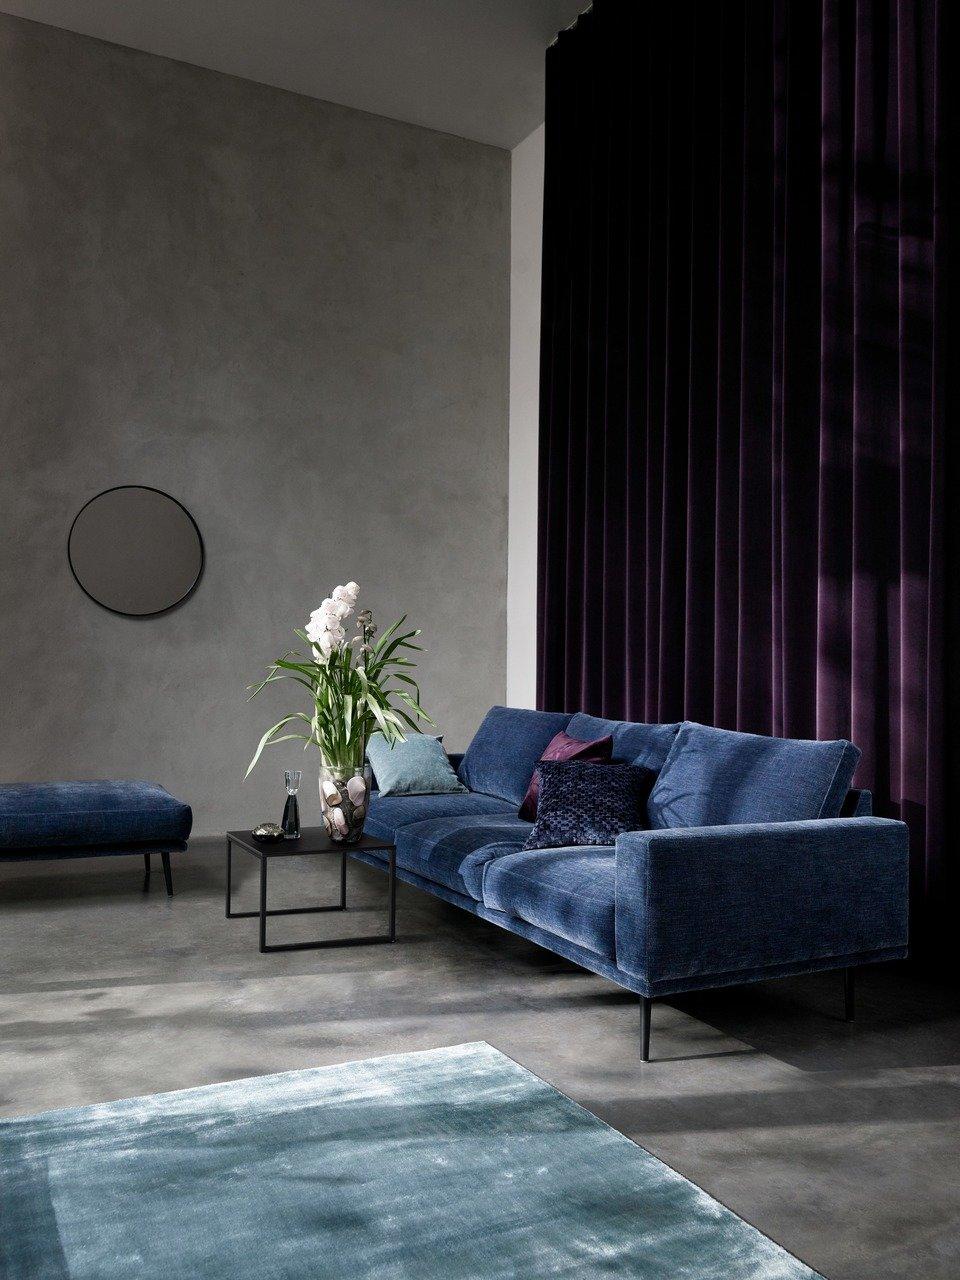 Sofa Carlton, ciemnoniebieska tkanina Napoli. Cena 9.796,- (Cena regularna 11.525,-)<br>Pufa Carlton, ciemnoniebieska tkanina Napoli. Cena 3.484,- (Cena regularna 4.099,-)<br><br>